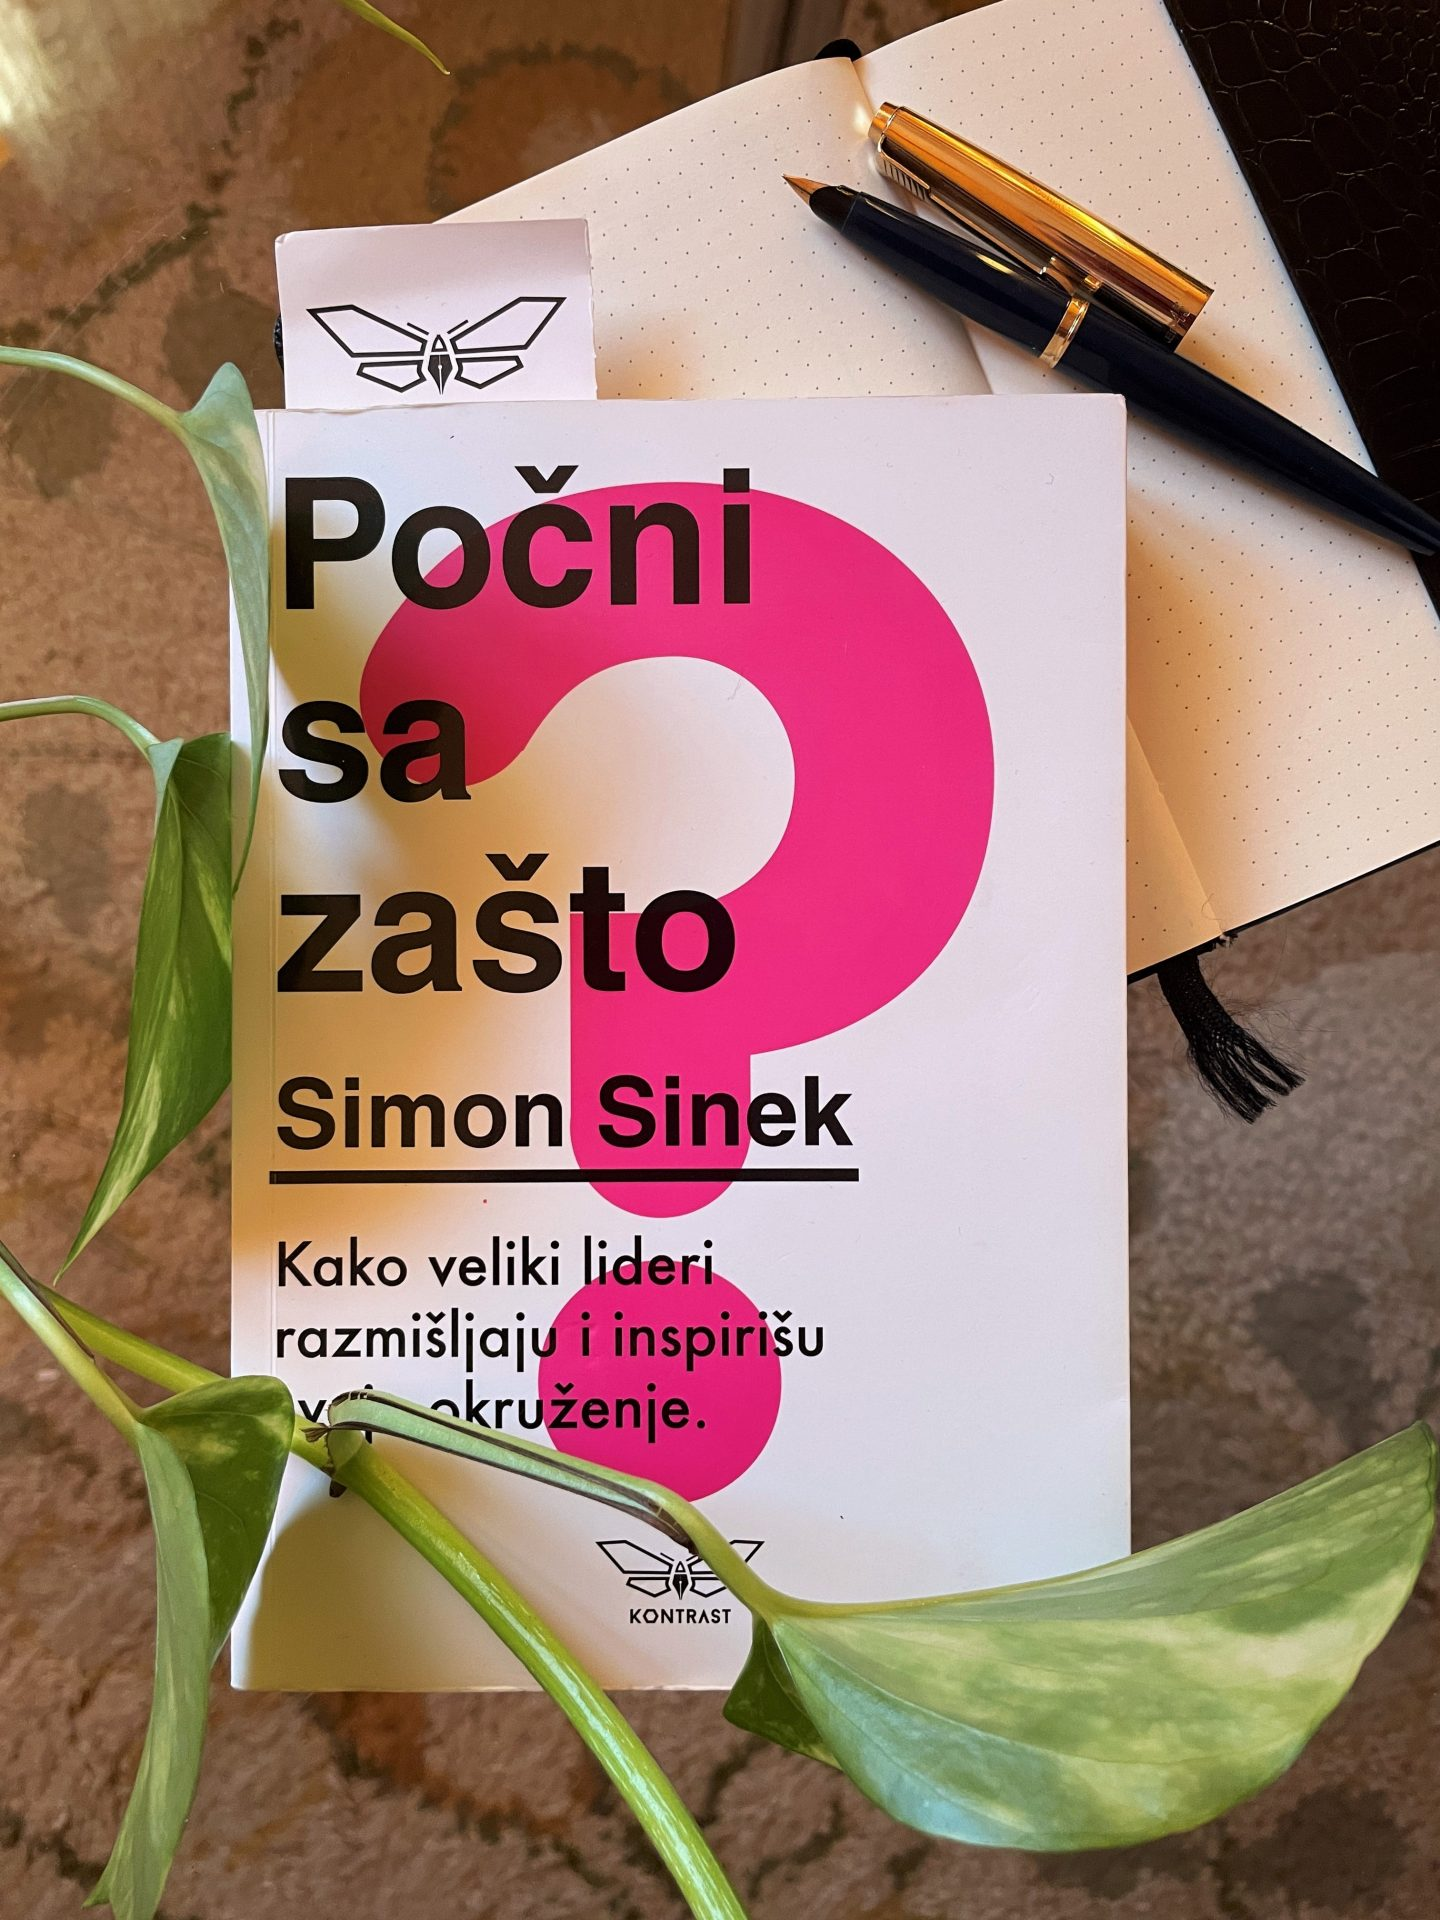 Simon Sinek Počni sa zašto © According to Kristina